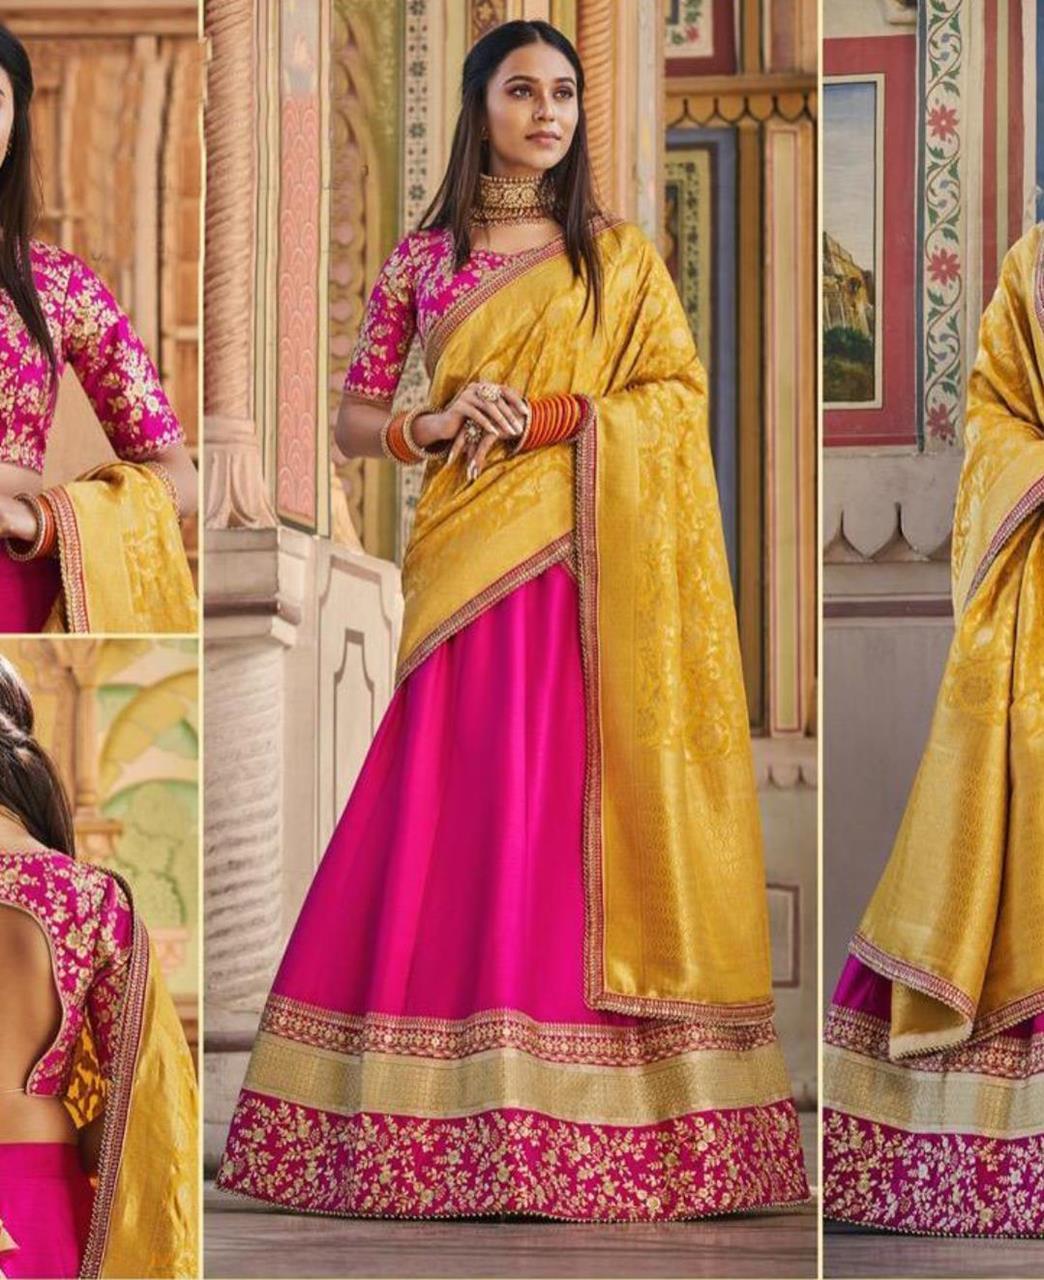 HandWorked Silk Lehenga in Rani Pink